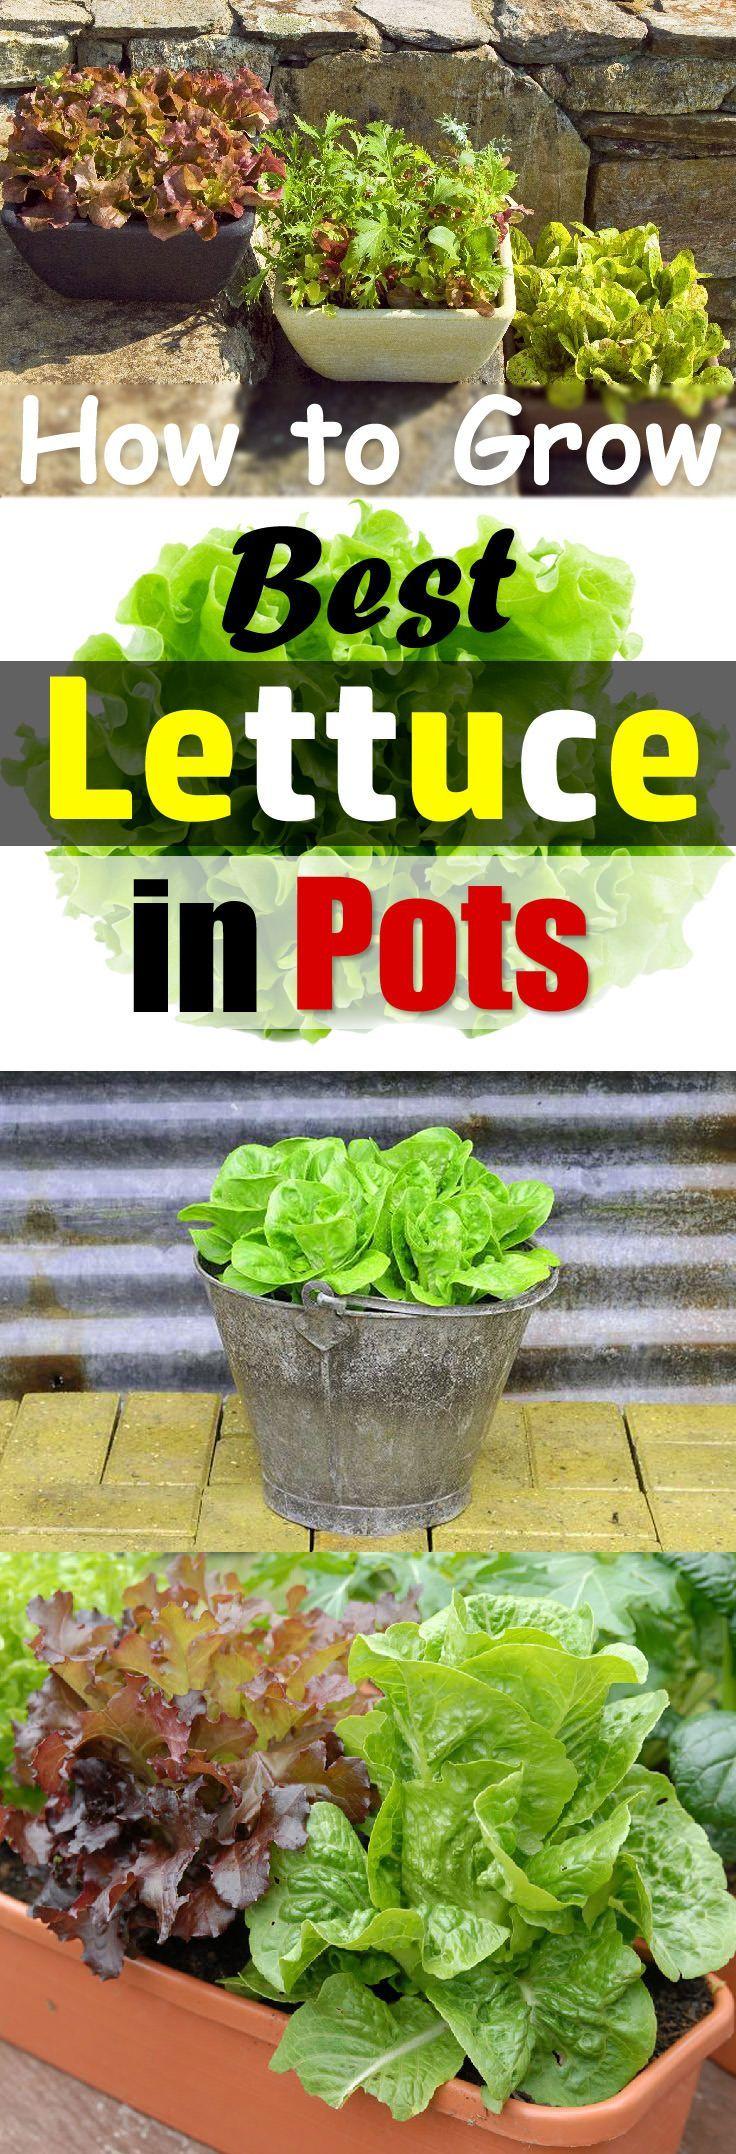 Growing lettuce in containers - Gemüse auf dem Balkon